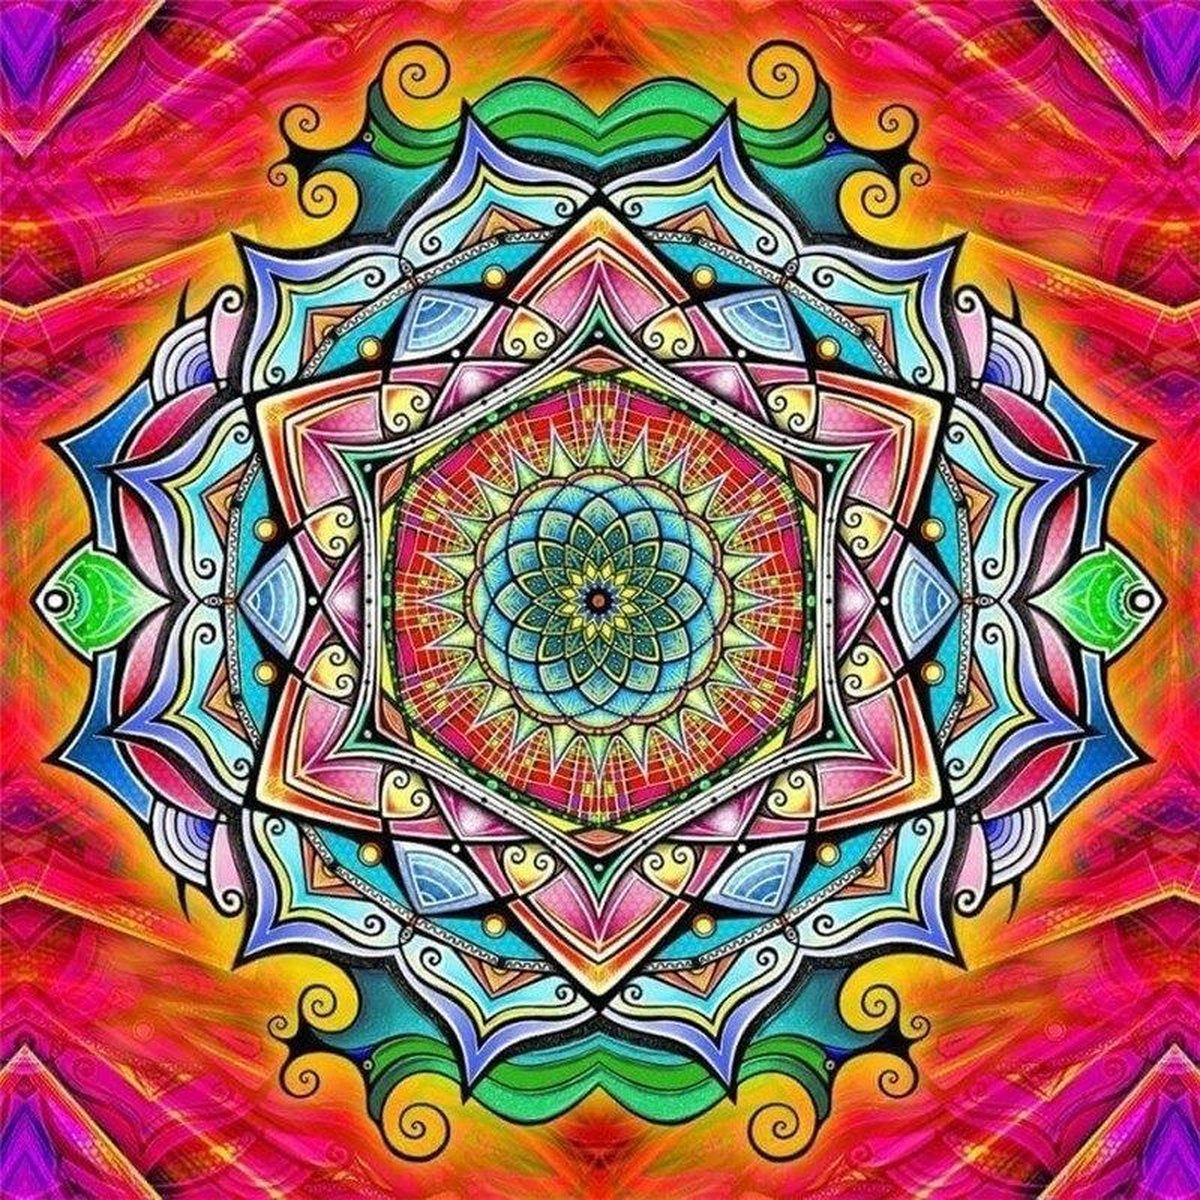 Premium Paintings - Mandala Regenboogkleuren - Diamond Painting Volwassenen - Pakket Volledig / Pakket Full - 30x40 - Moederdag cadeautje